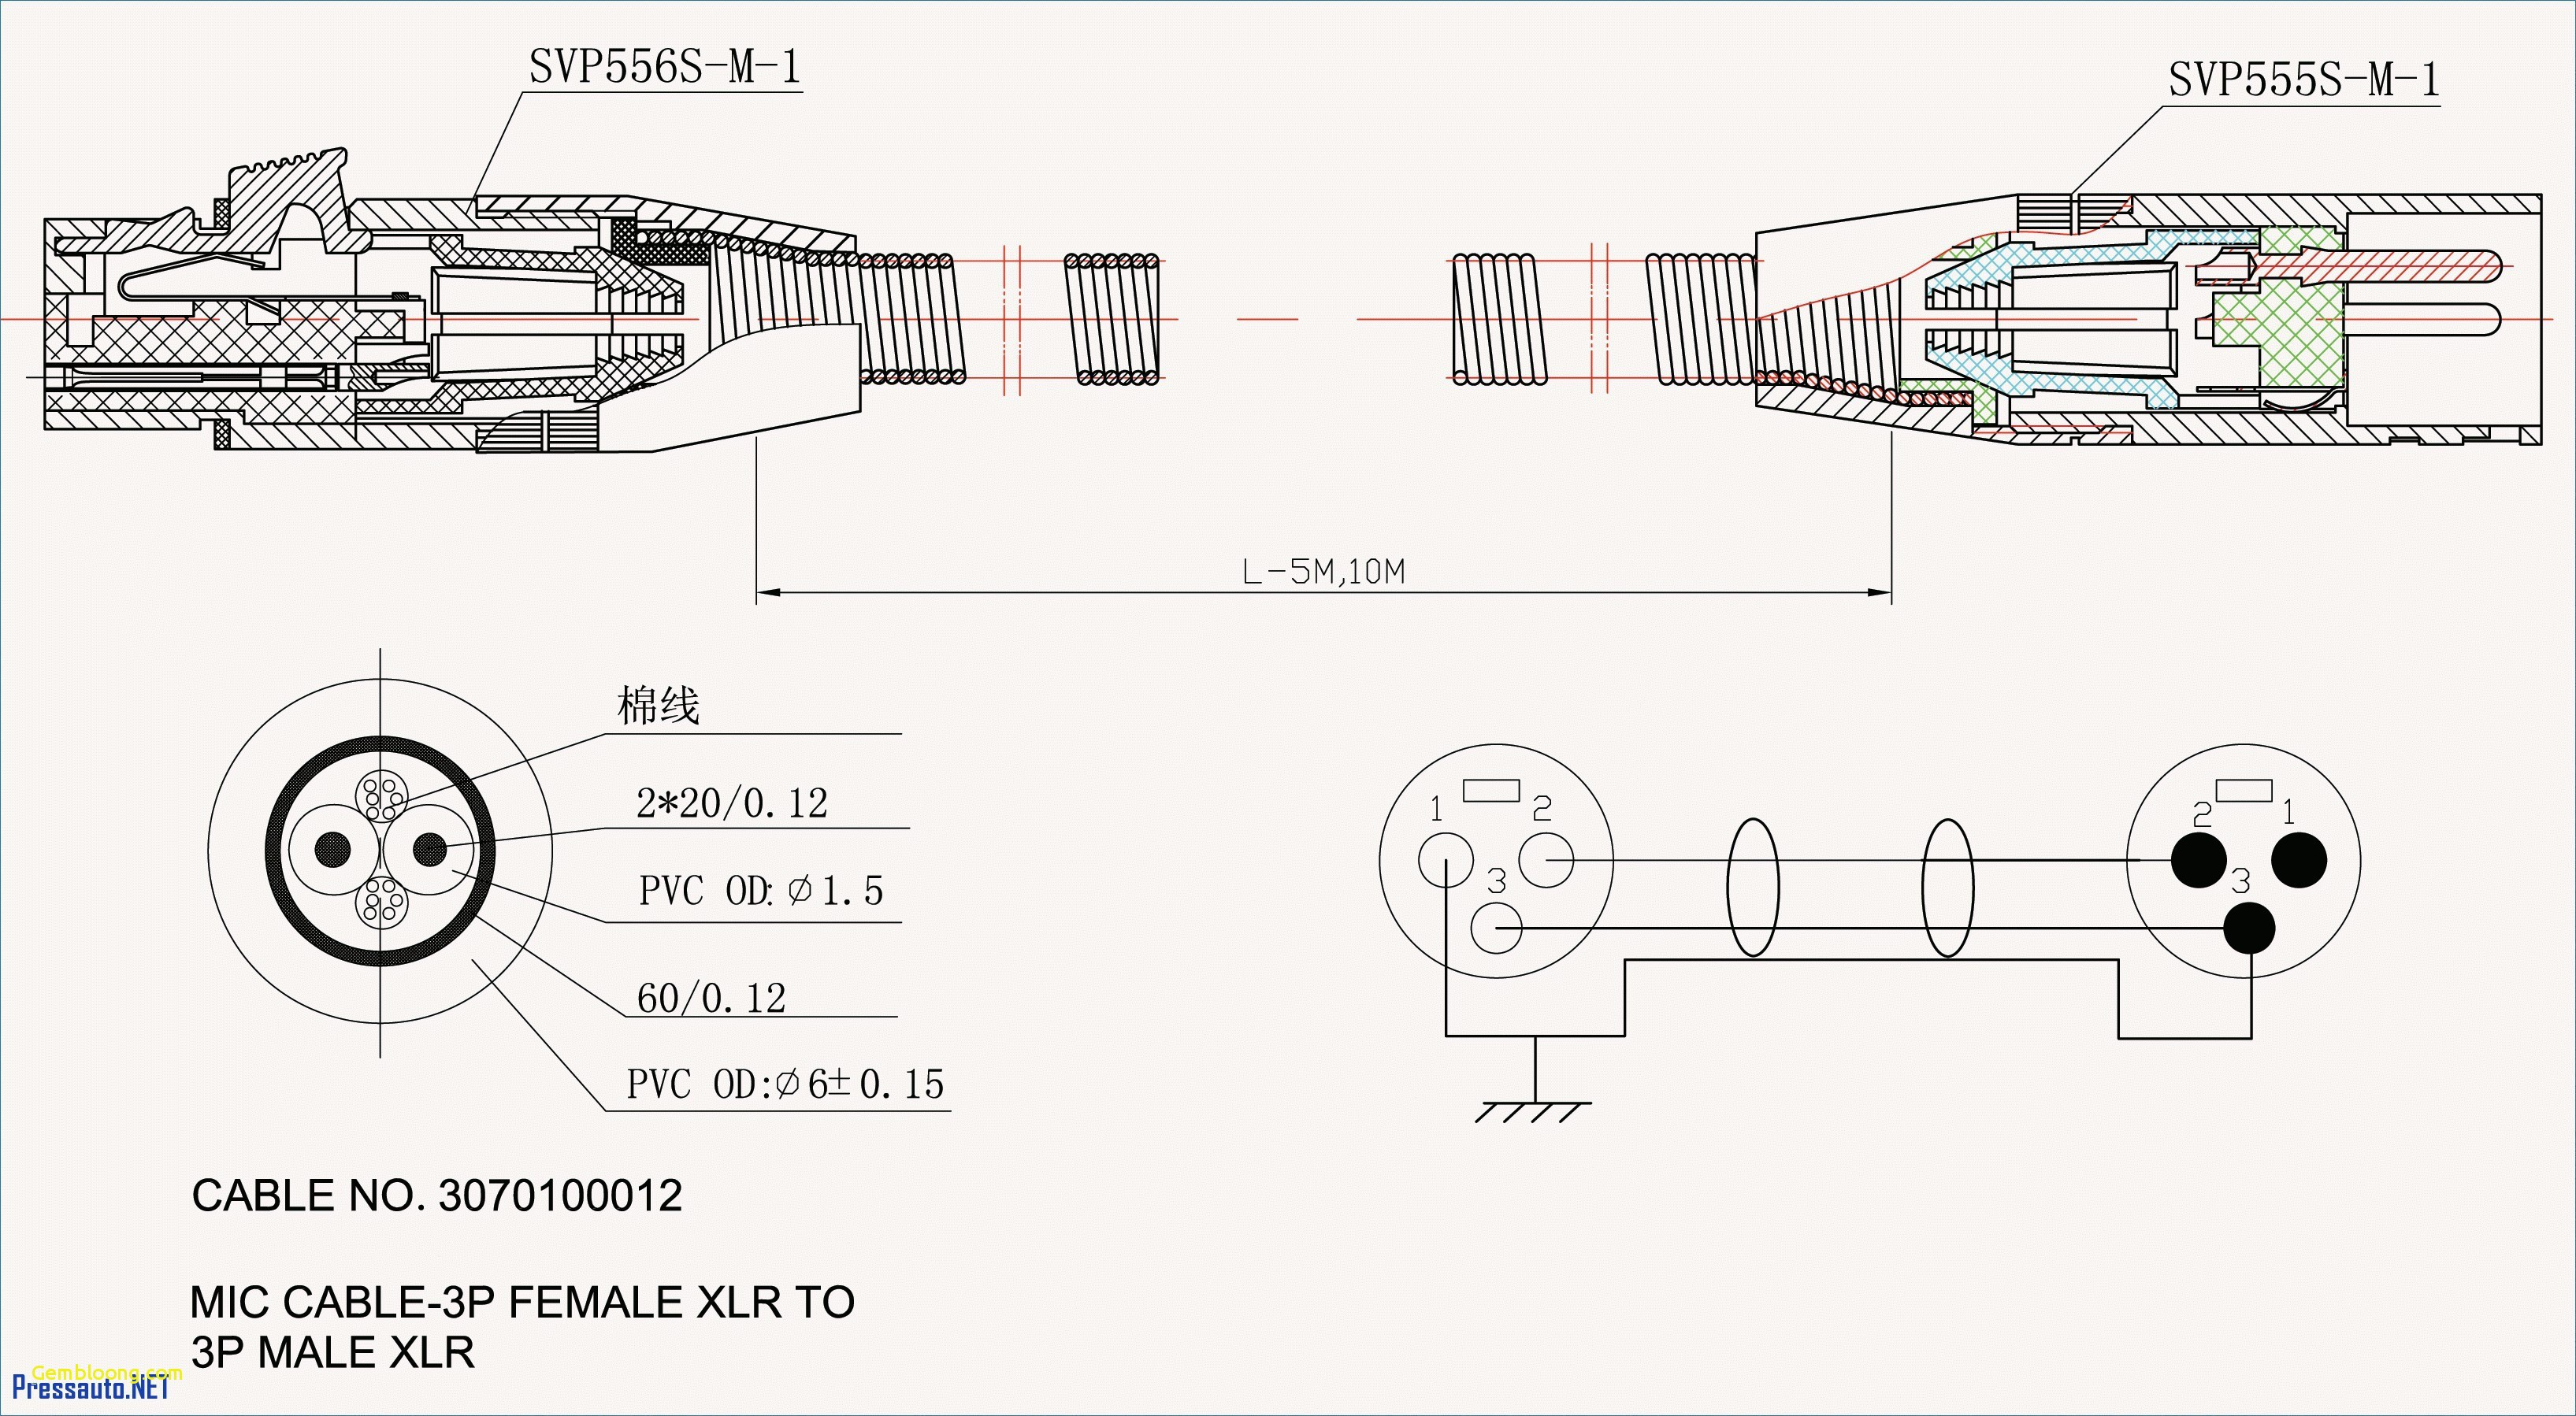 Boat Trailer Wiring Diagram 4 Way Wiring Diagram Brake Boat Trailer Que Of Boat Trailer Wiring Diagram 4 Way